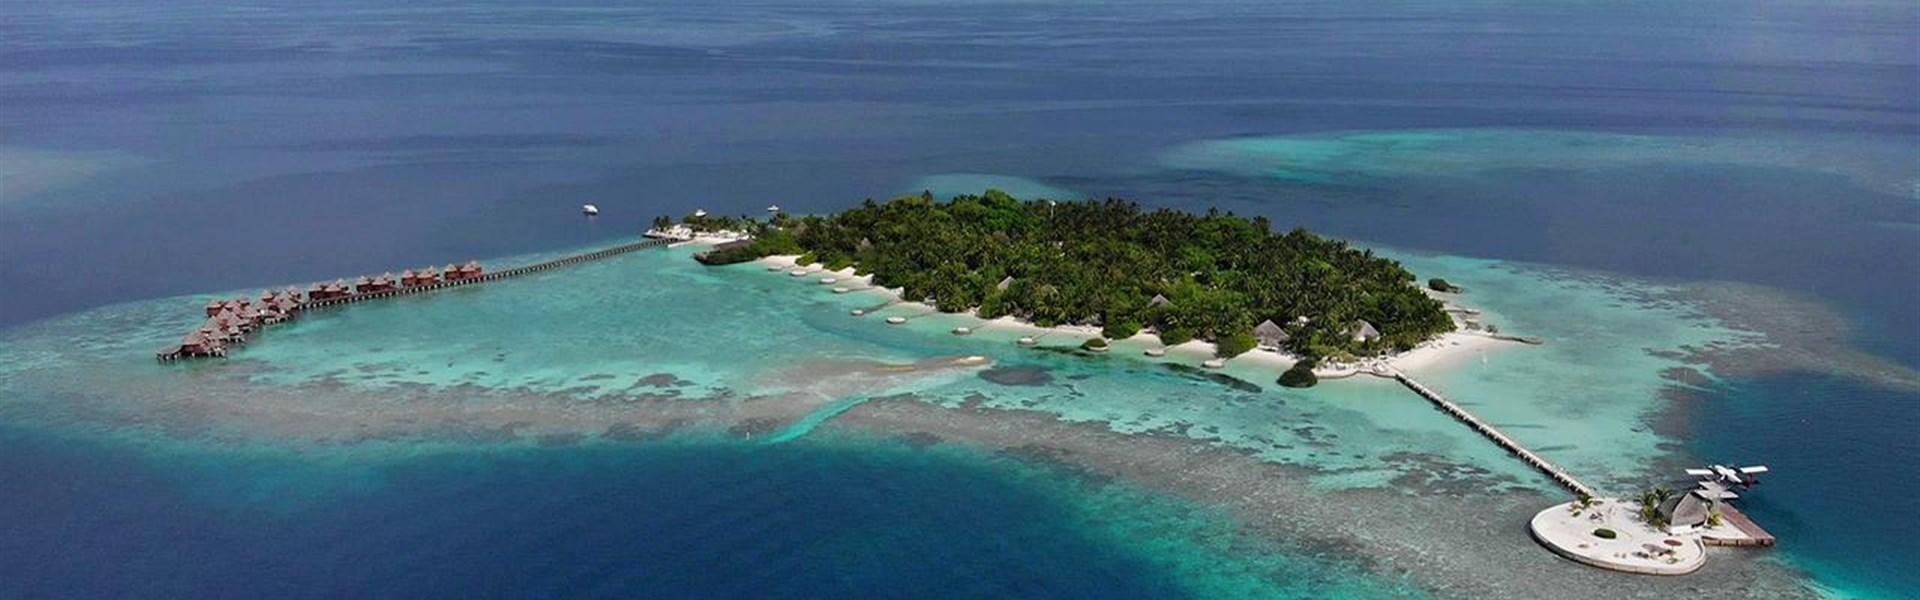 Marco Polo - Nika Island Resort & Spa -